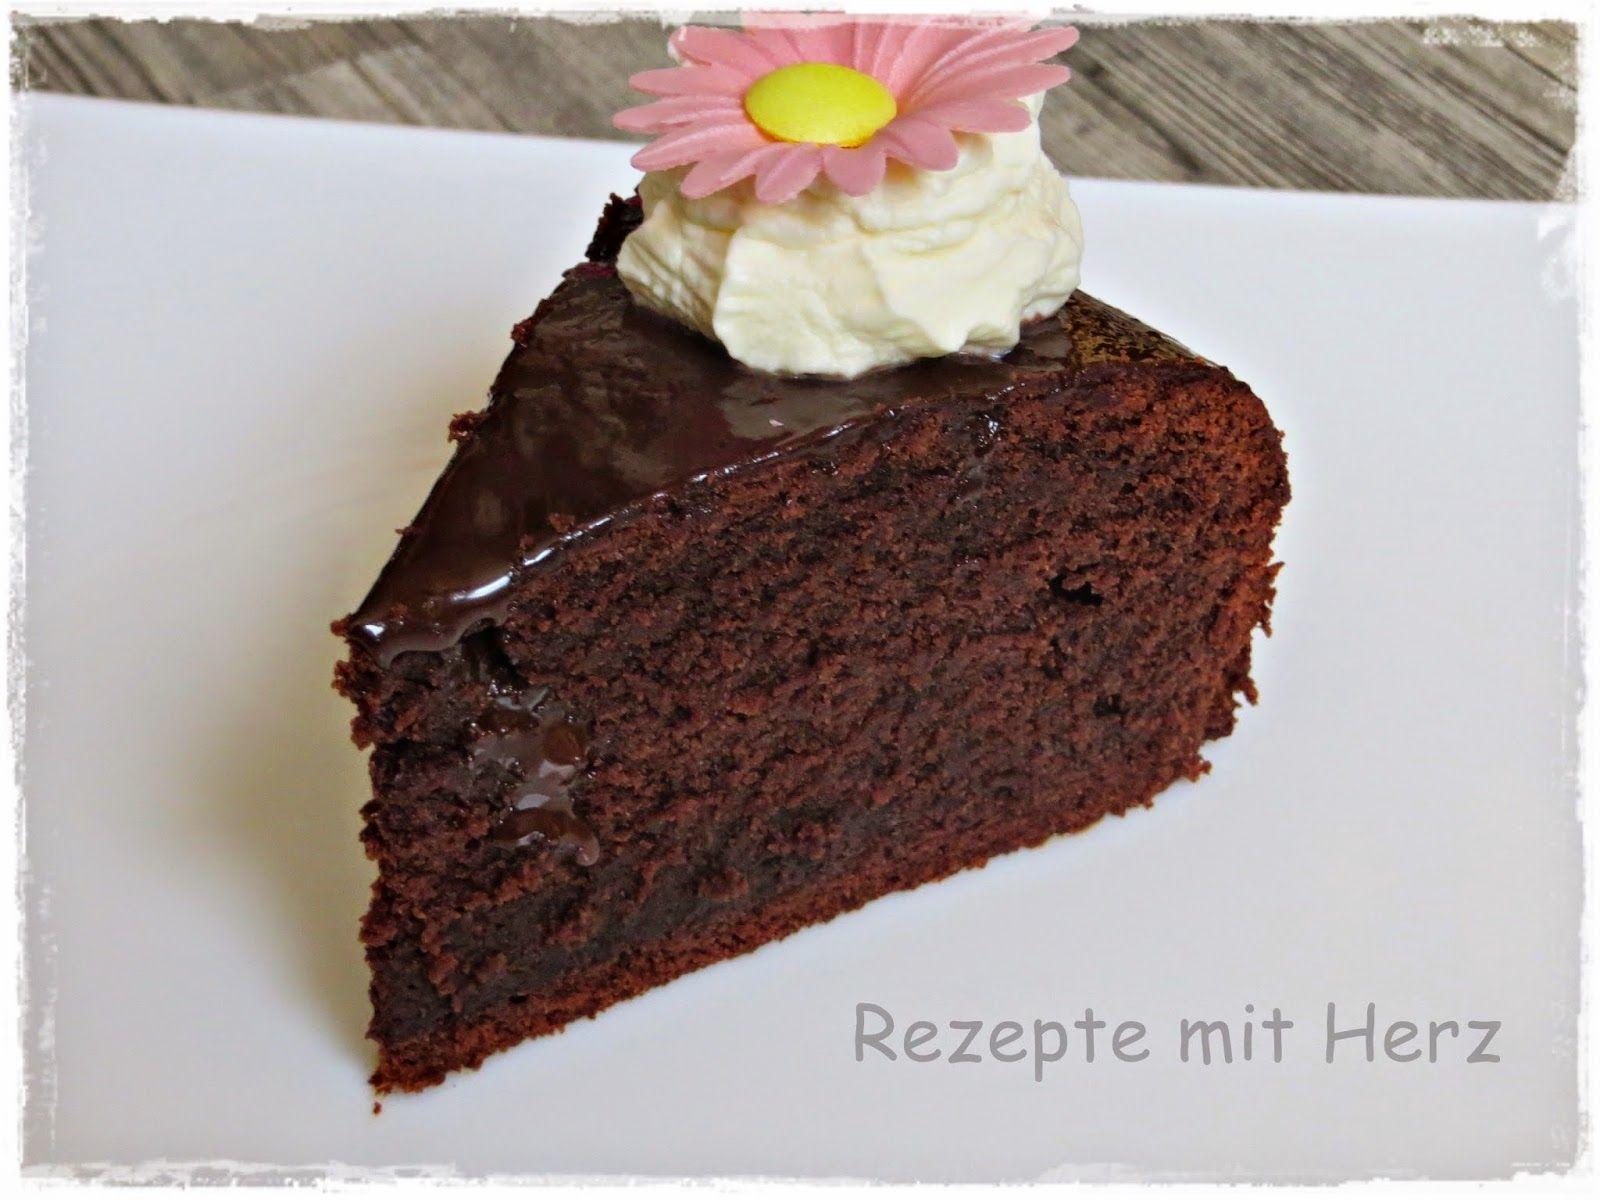 Chocolate Mud Cake Thermomix Rezepte Mit Herz Thermomix